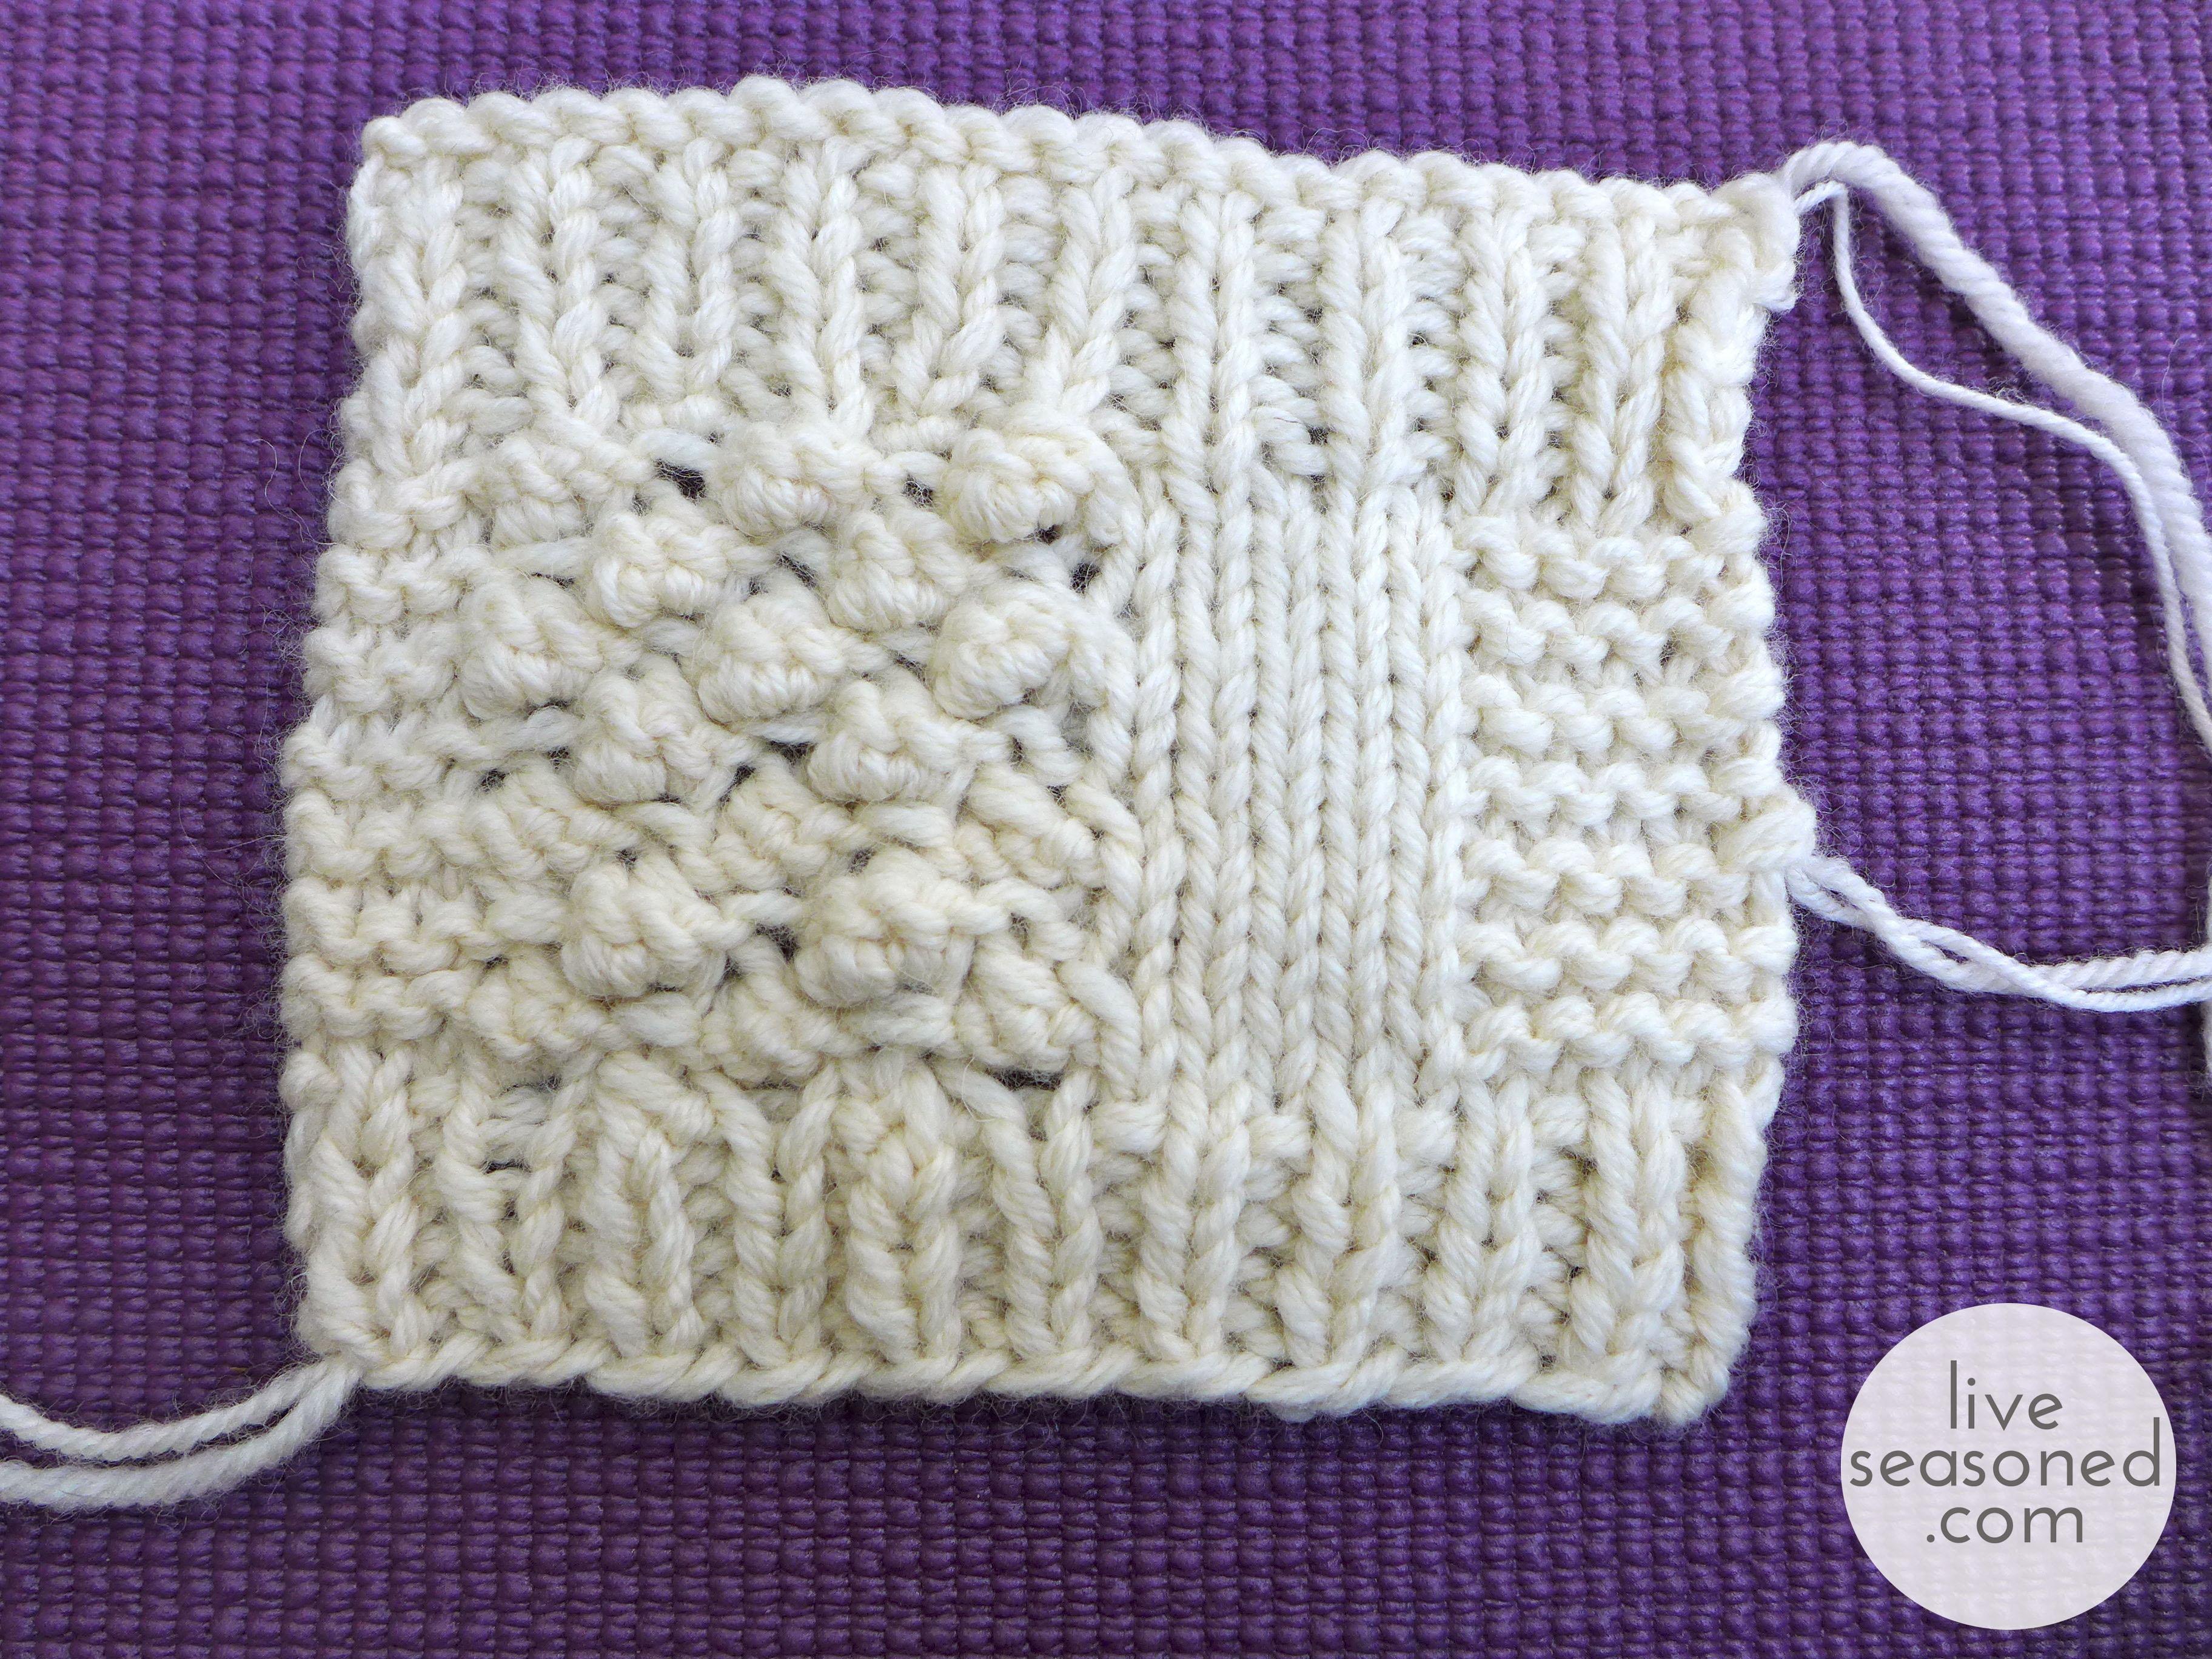 Knit Stitch Vs Stockinette : Project Sweater : Update 1